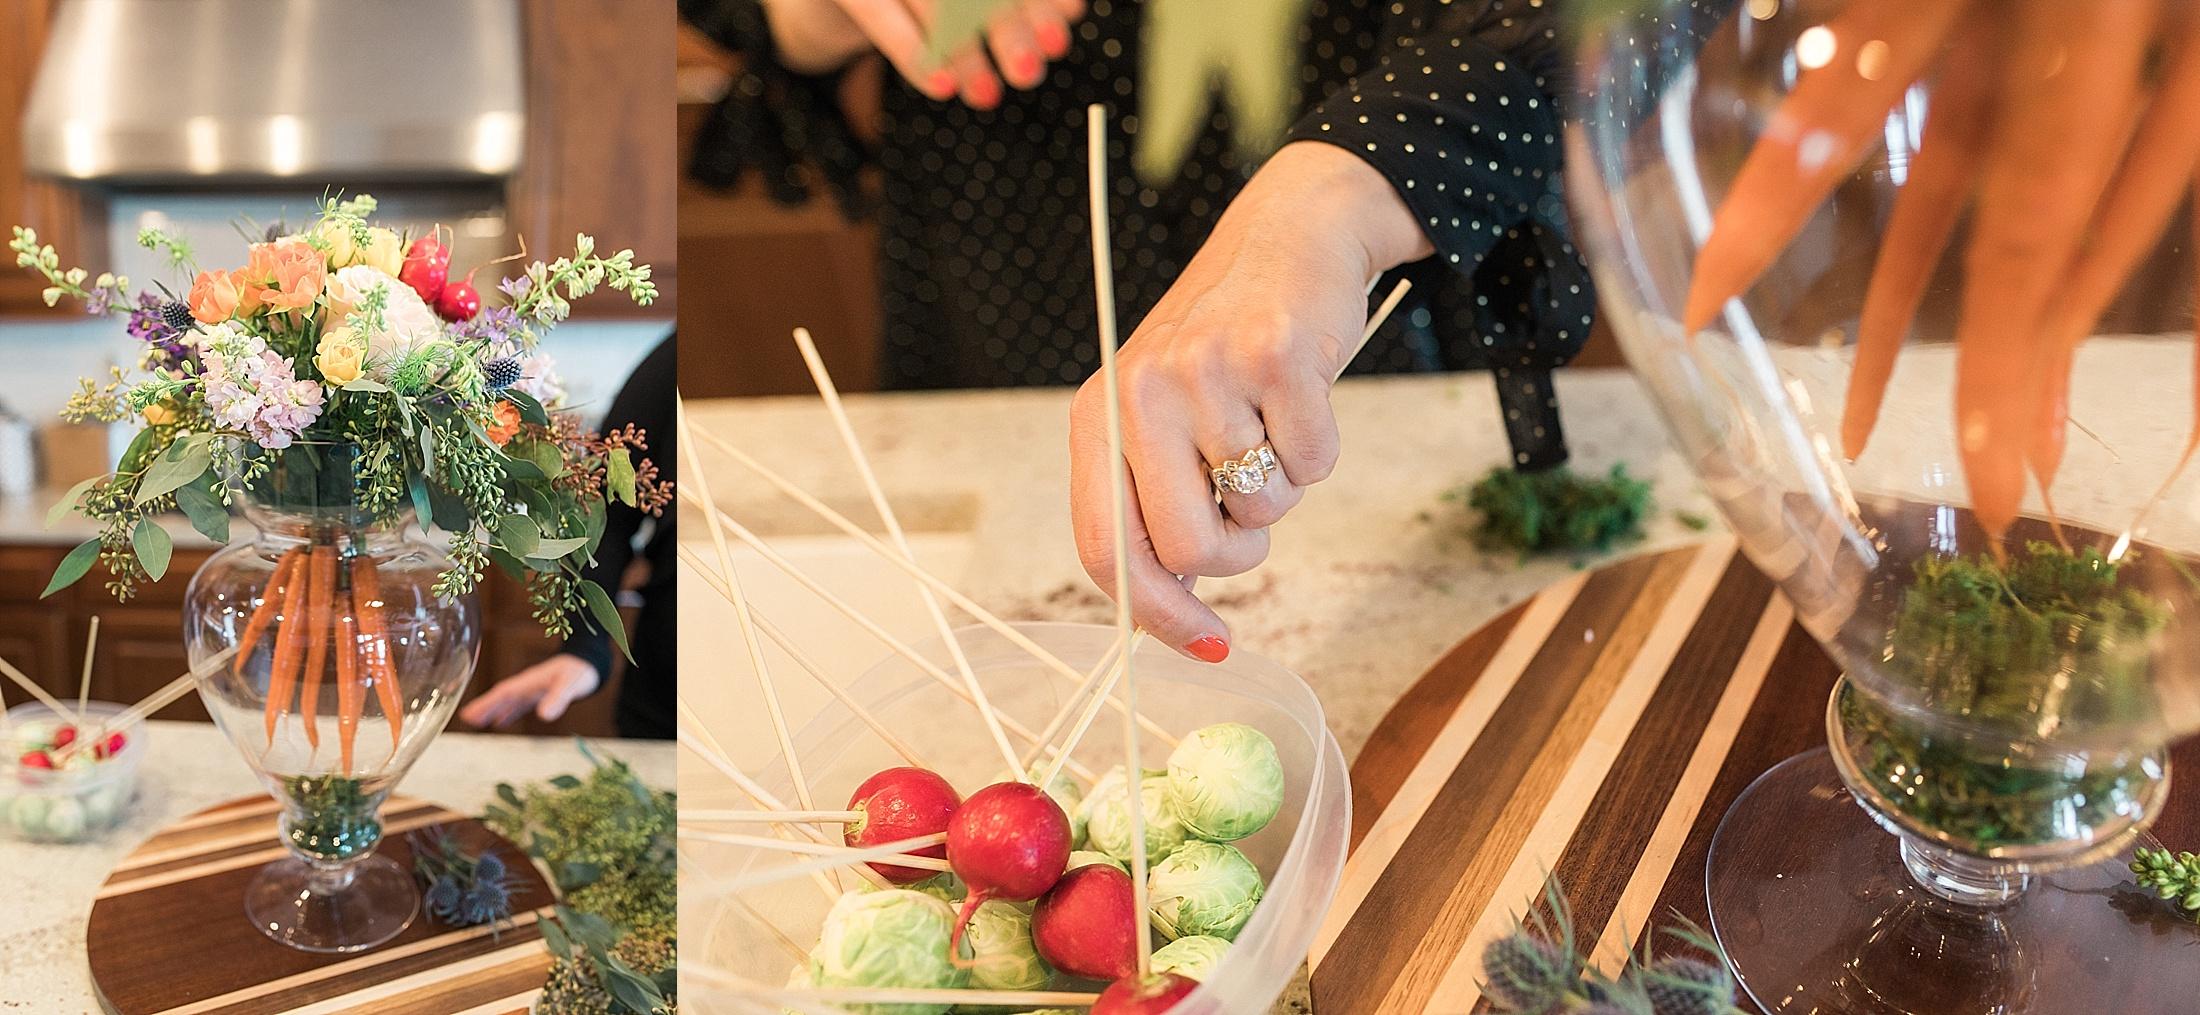 champaign-illinois-florist-watercan-designs-easter-spring-vegetable-flower-arrangement_2021.jpg